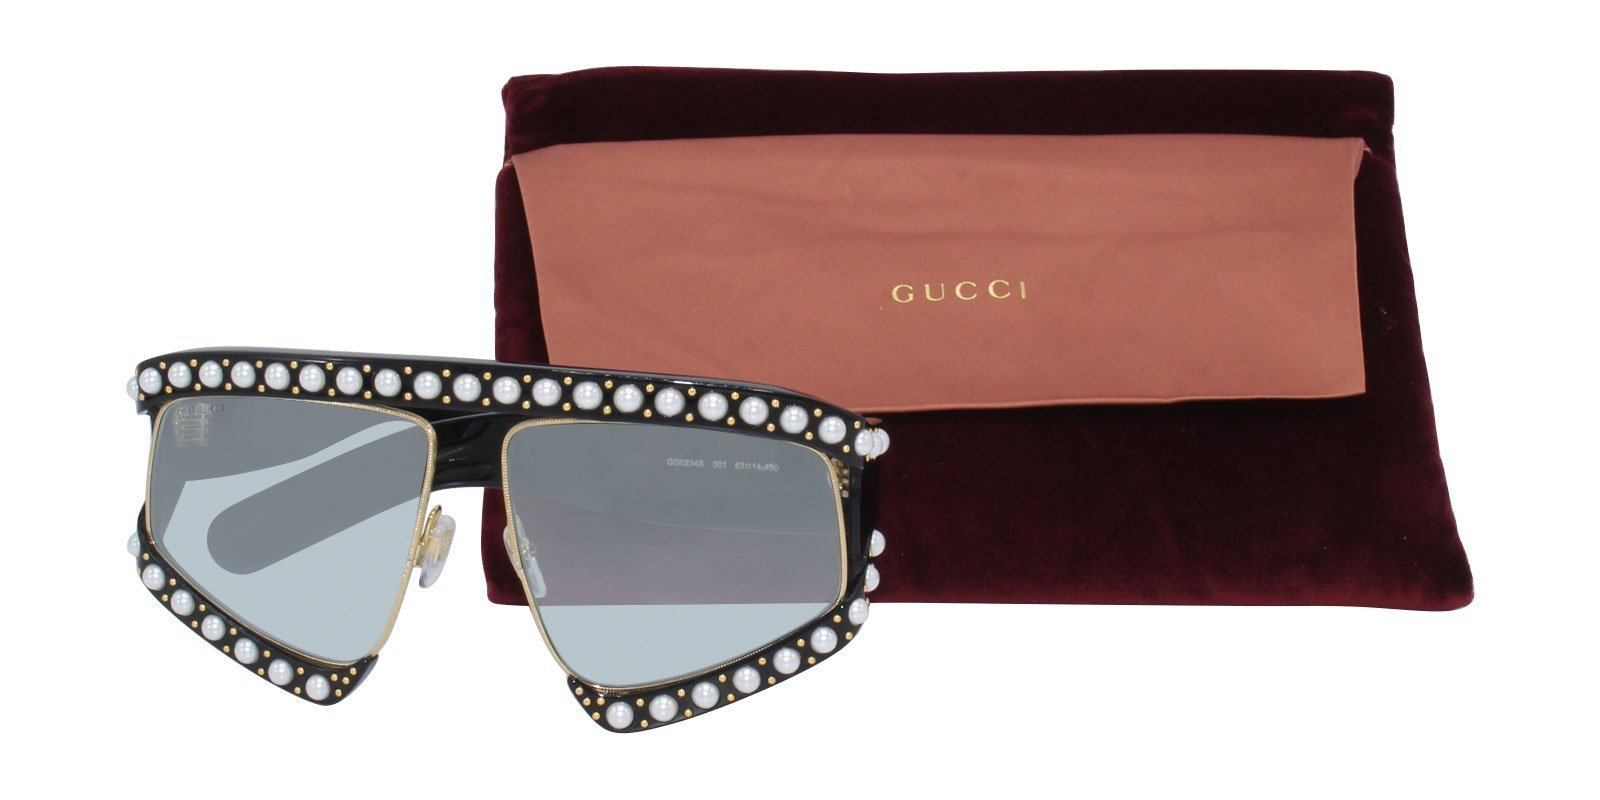 0b459bcc95 Nicki Minaj Wearing Gucci GG0234S Sunglasses In The Light Is Coming ...